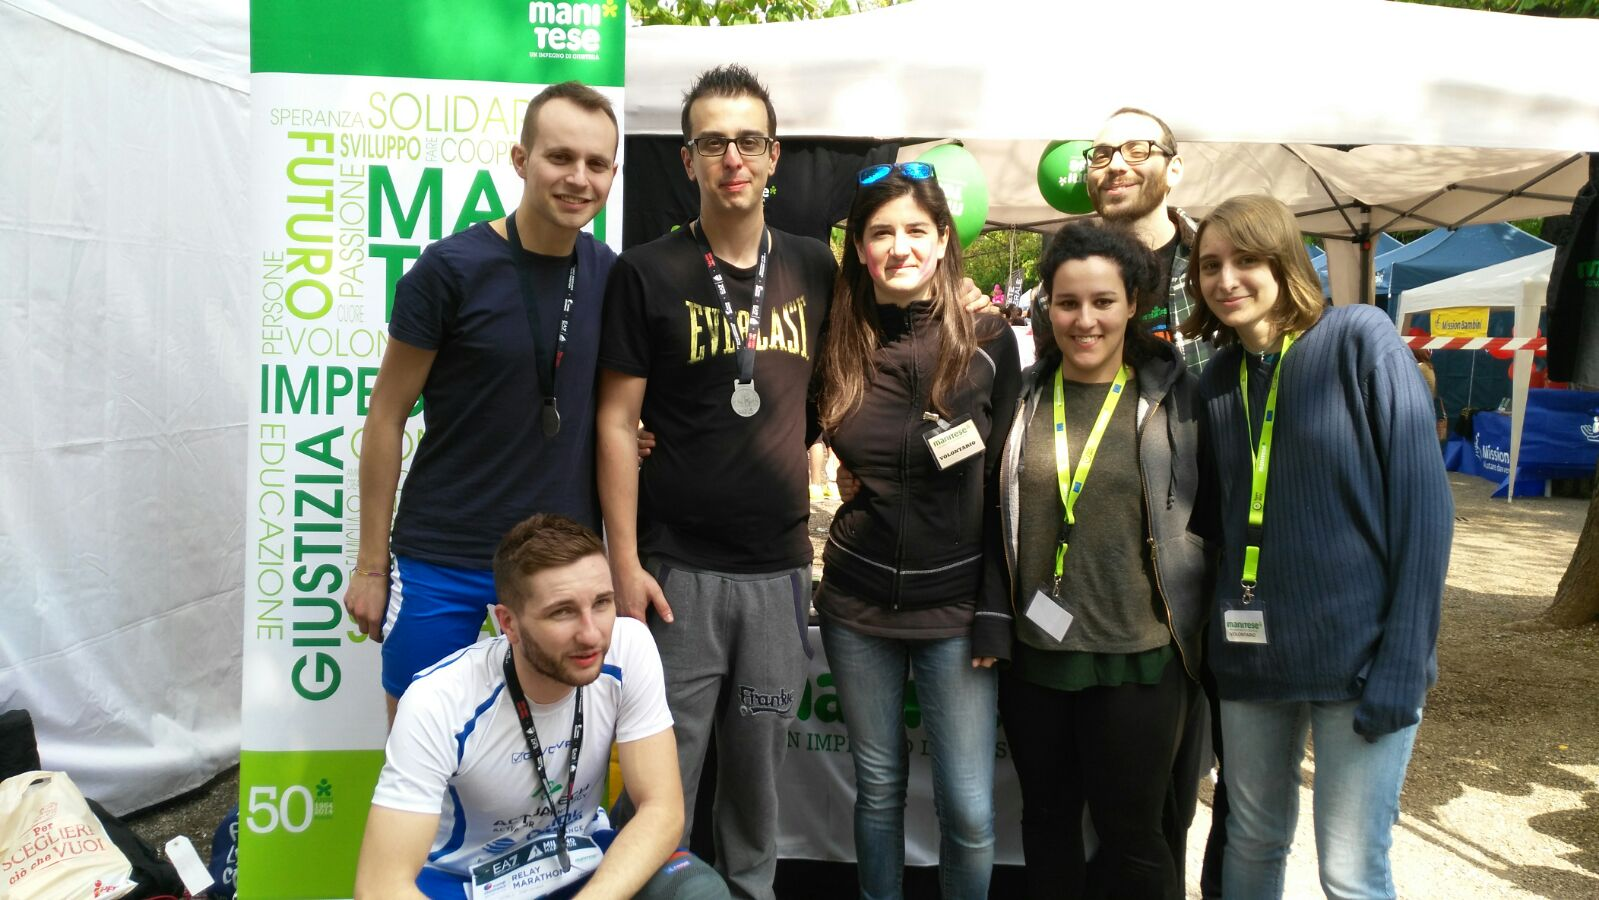 Milano_Marathon_9_Mani_Tese_2017